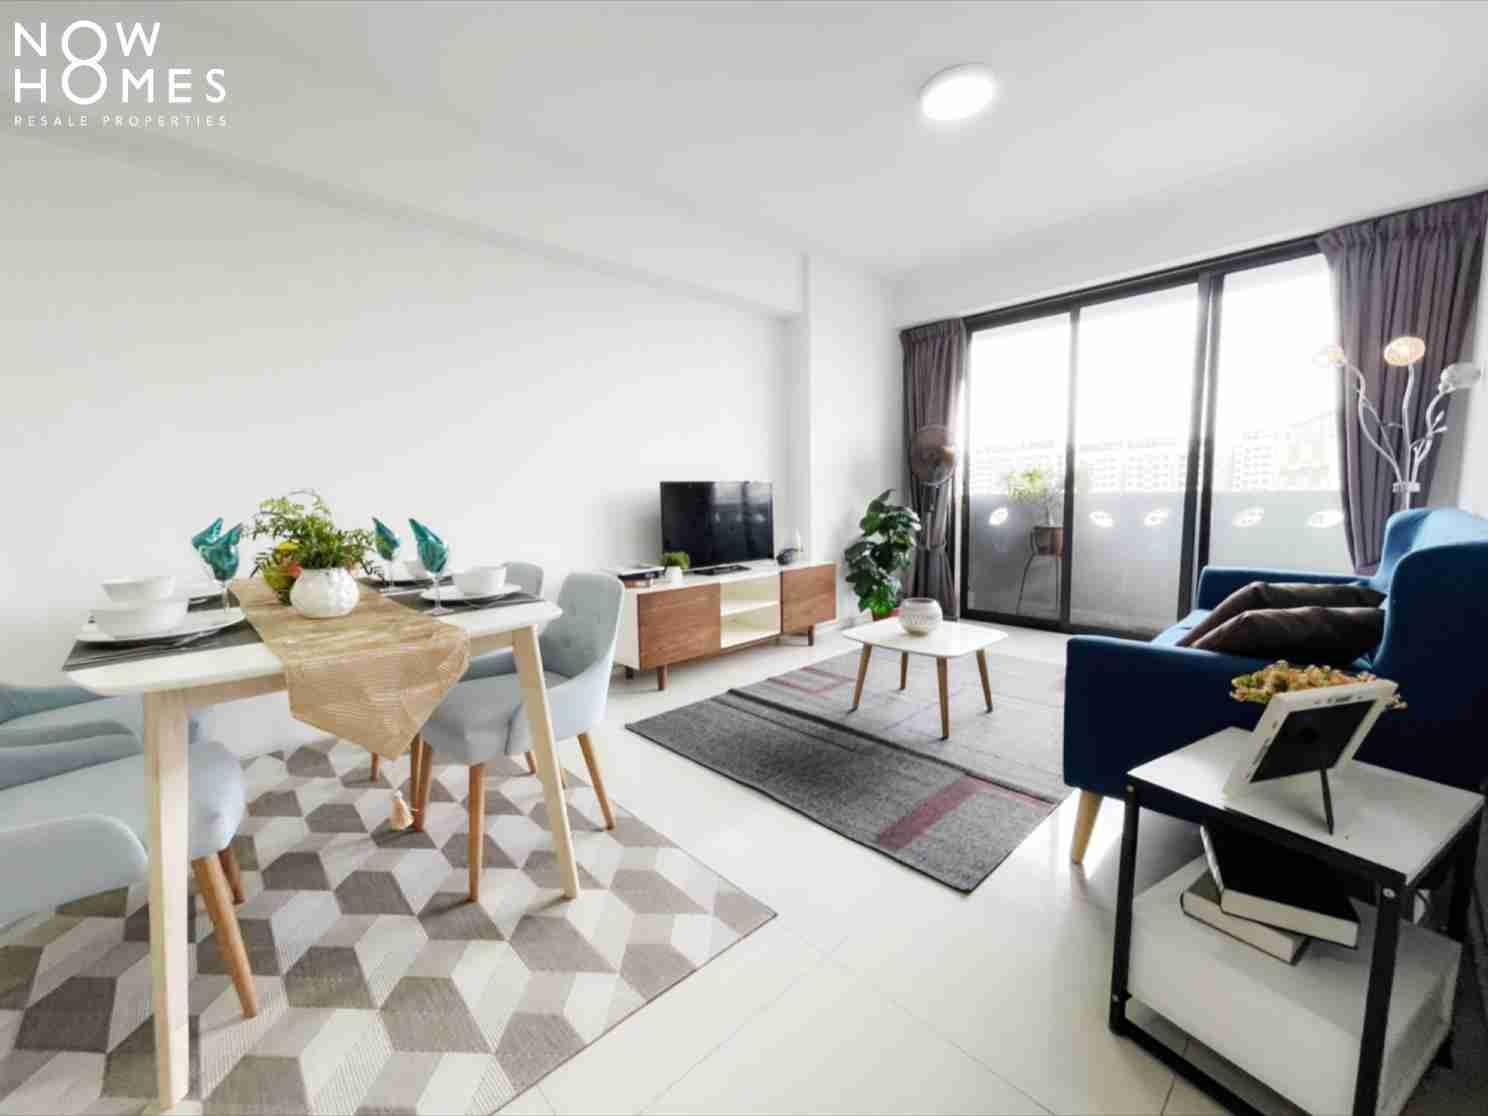 punggol resale property - 310B Punggol Walk - Living Room side view repeat